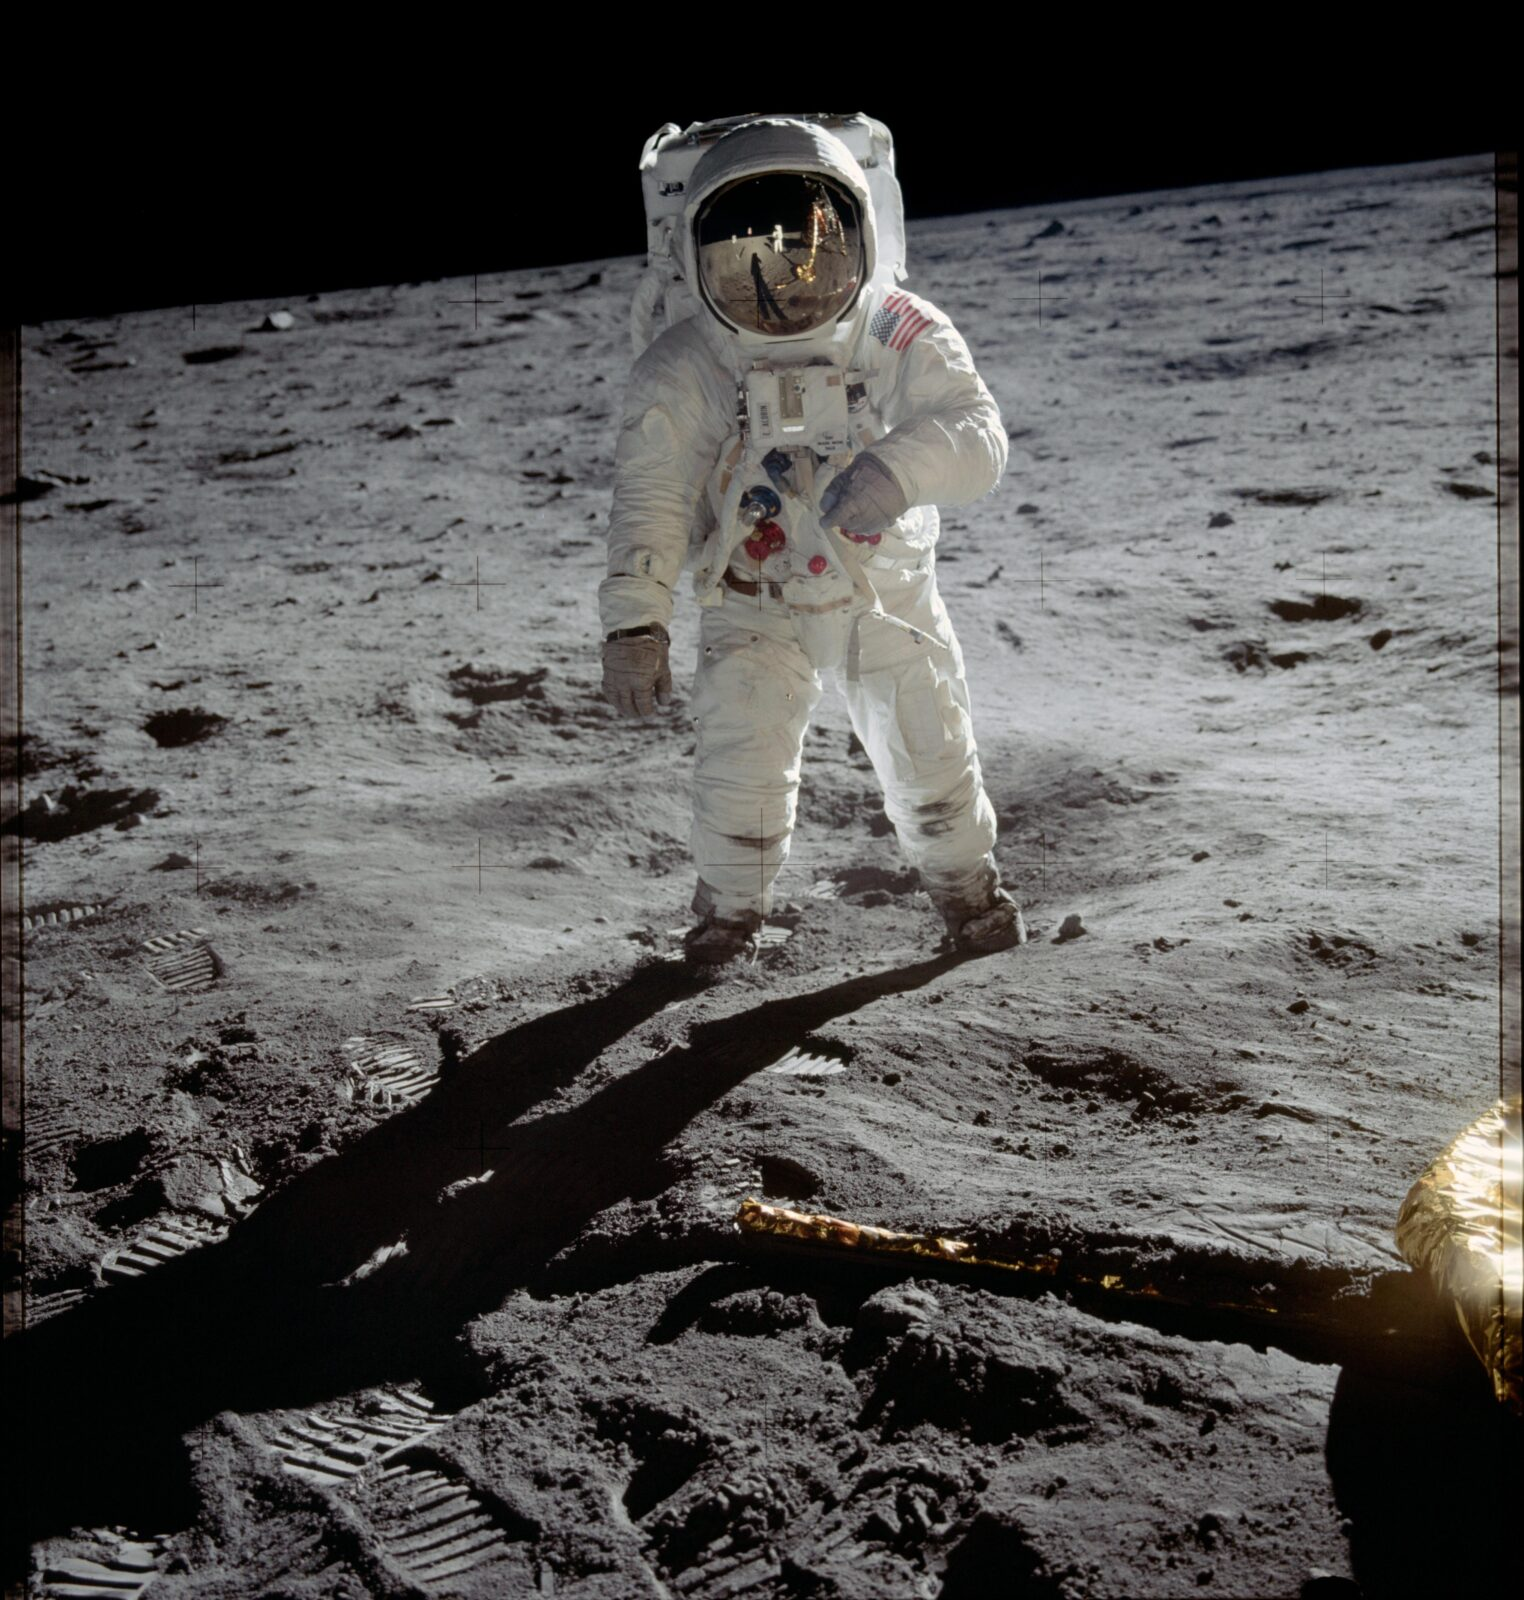 luna-astronavty-moon-landing-bazz-oldrin